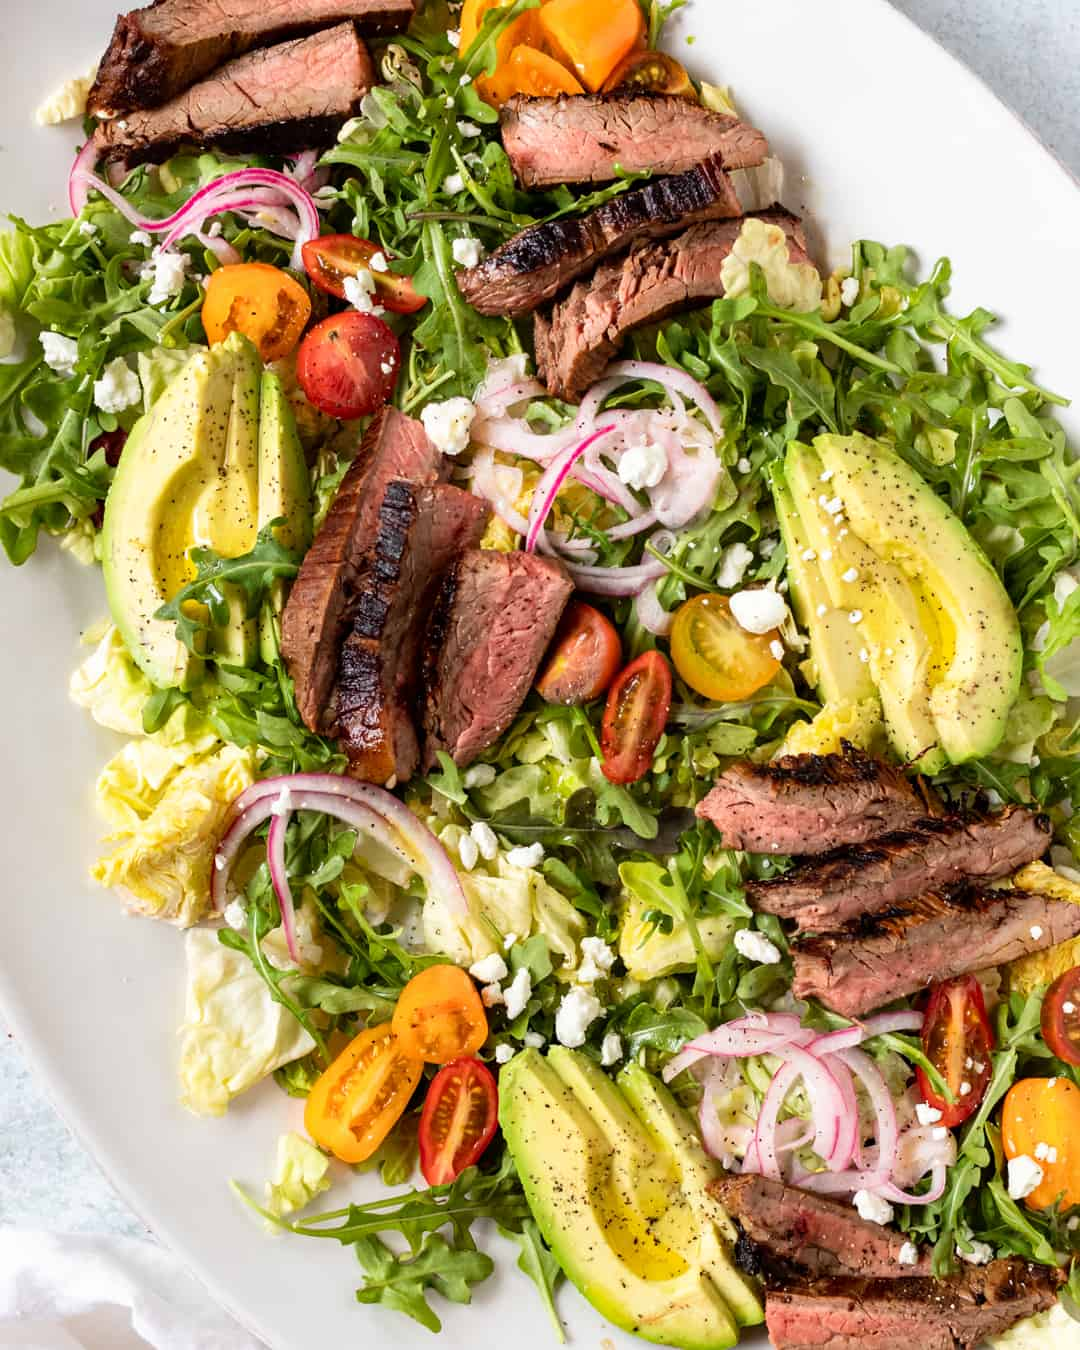 Flank Steak Salad with Homemade Creamy Balsamic Dressing